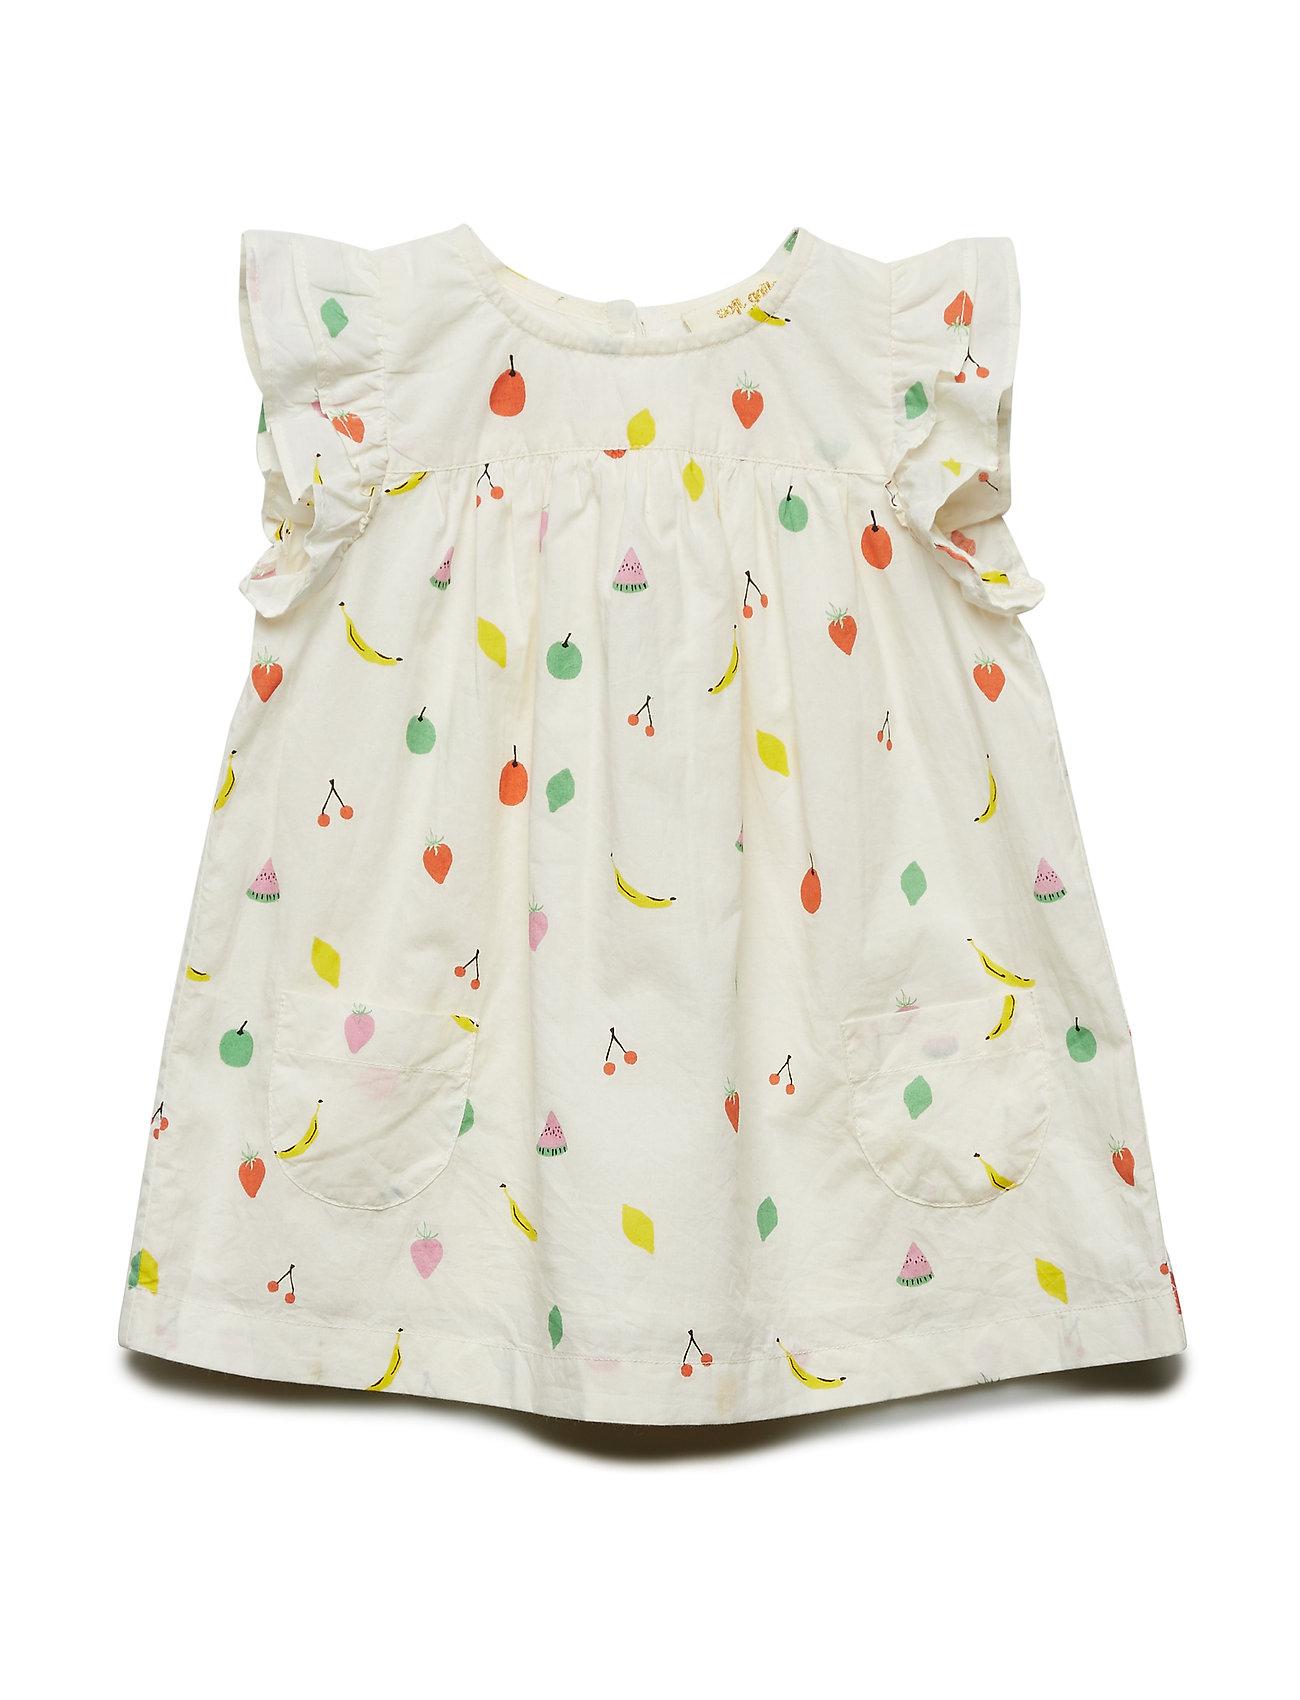 Soft Gallery Bebe Dress - PRISTINE, AOP FRUITY